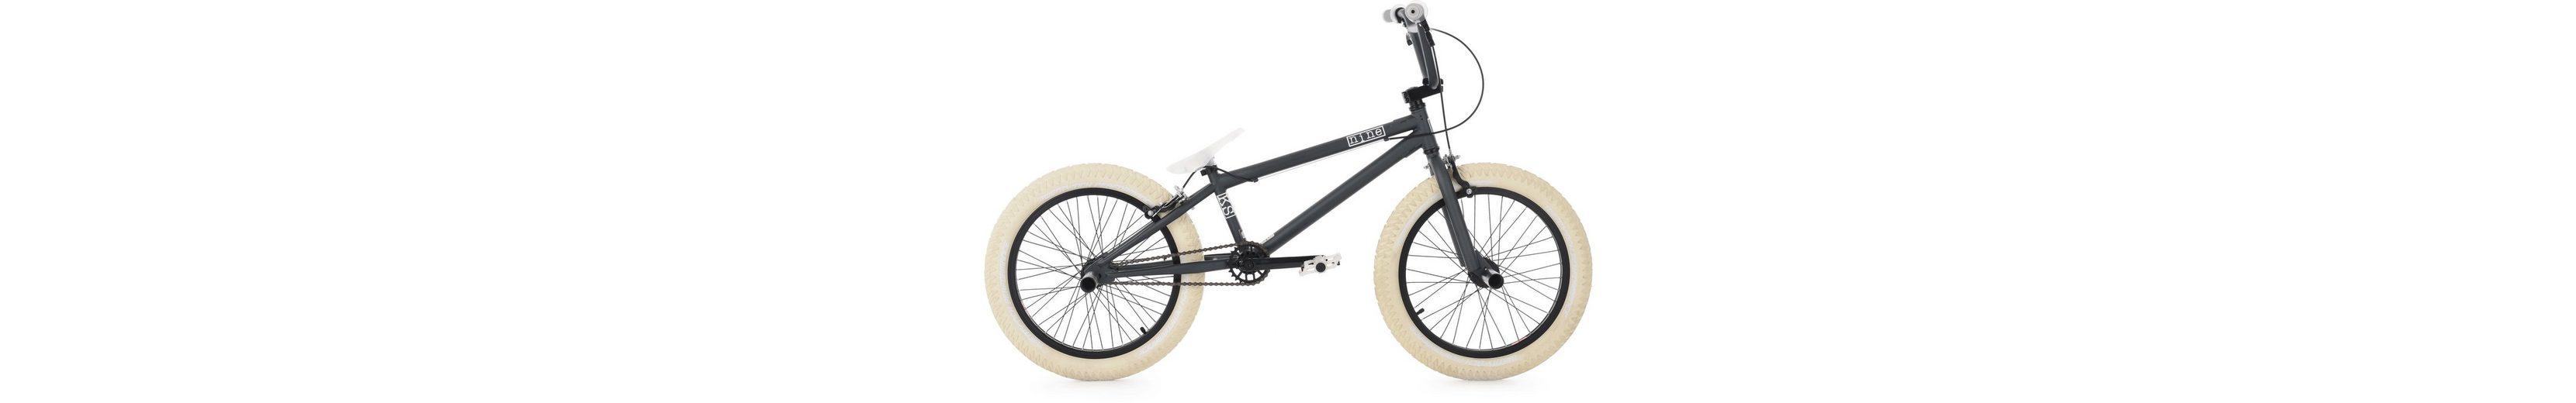 KS Cycling BMX Fahrrad,20 Zoll, »Nine«